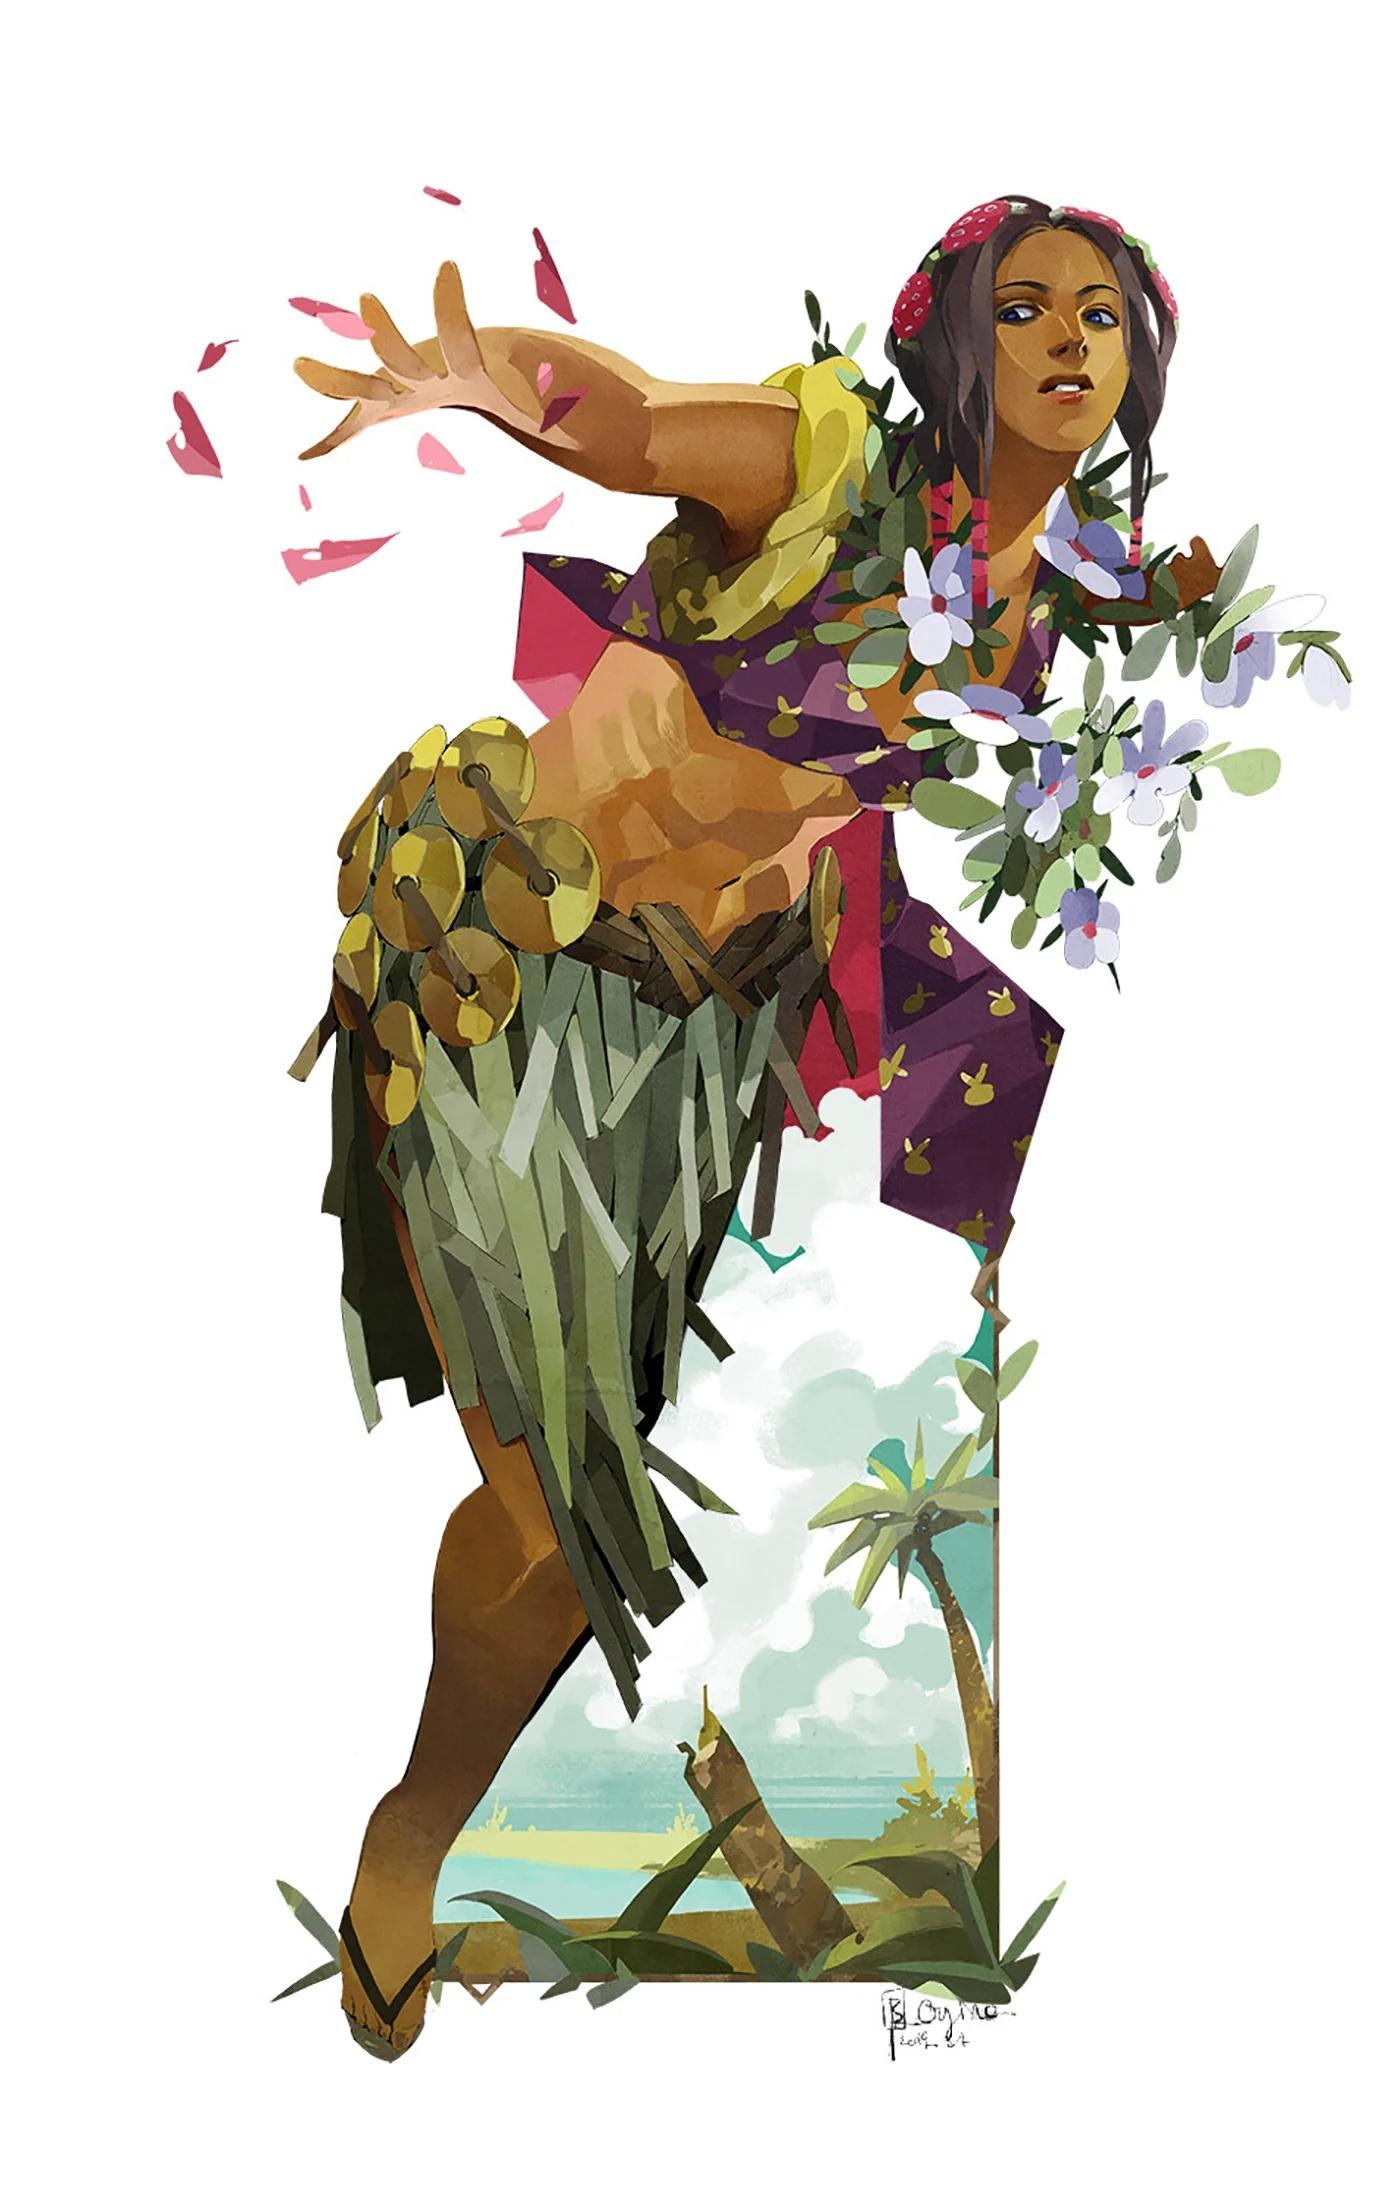 Boell Oyino角色<a href=http://www.pj60013.com/ target=_blank class=infotextkey>设计</a>和概念<a href=http://www.pj60013.com/sheji/chahua/ target=_blank class=infotextkey>插画</a>艺术